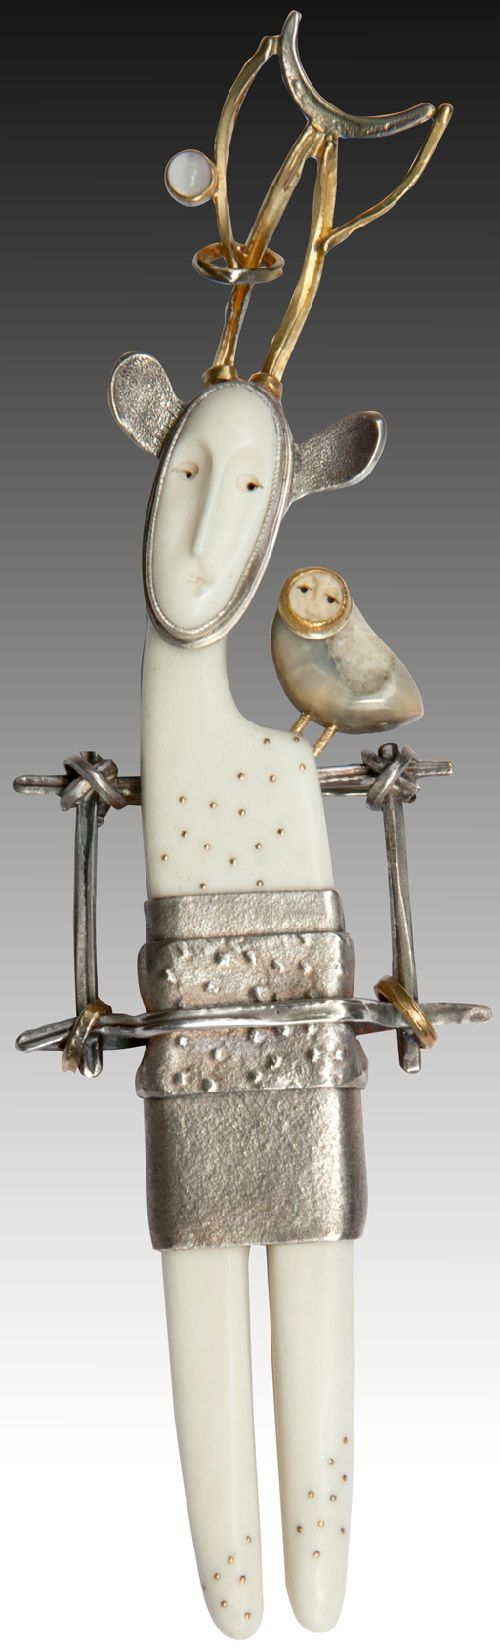 Carolyn Morris Bach jewelry art